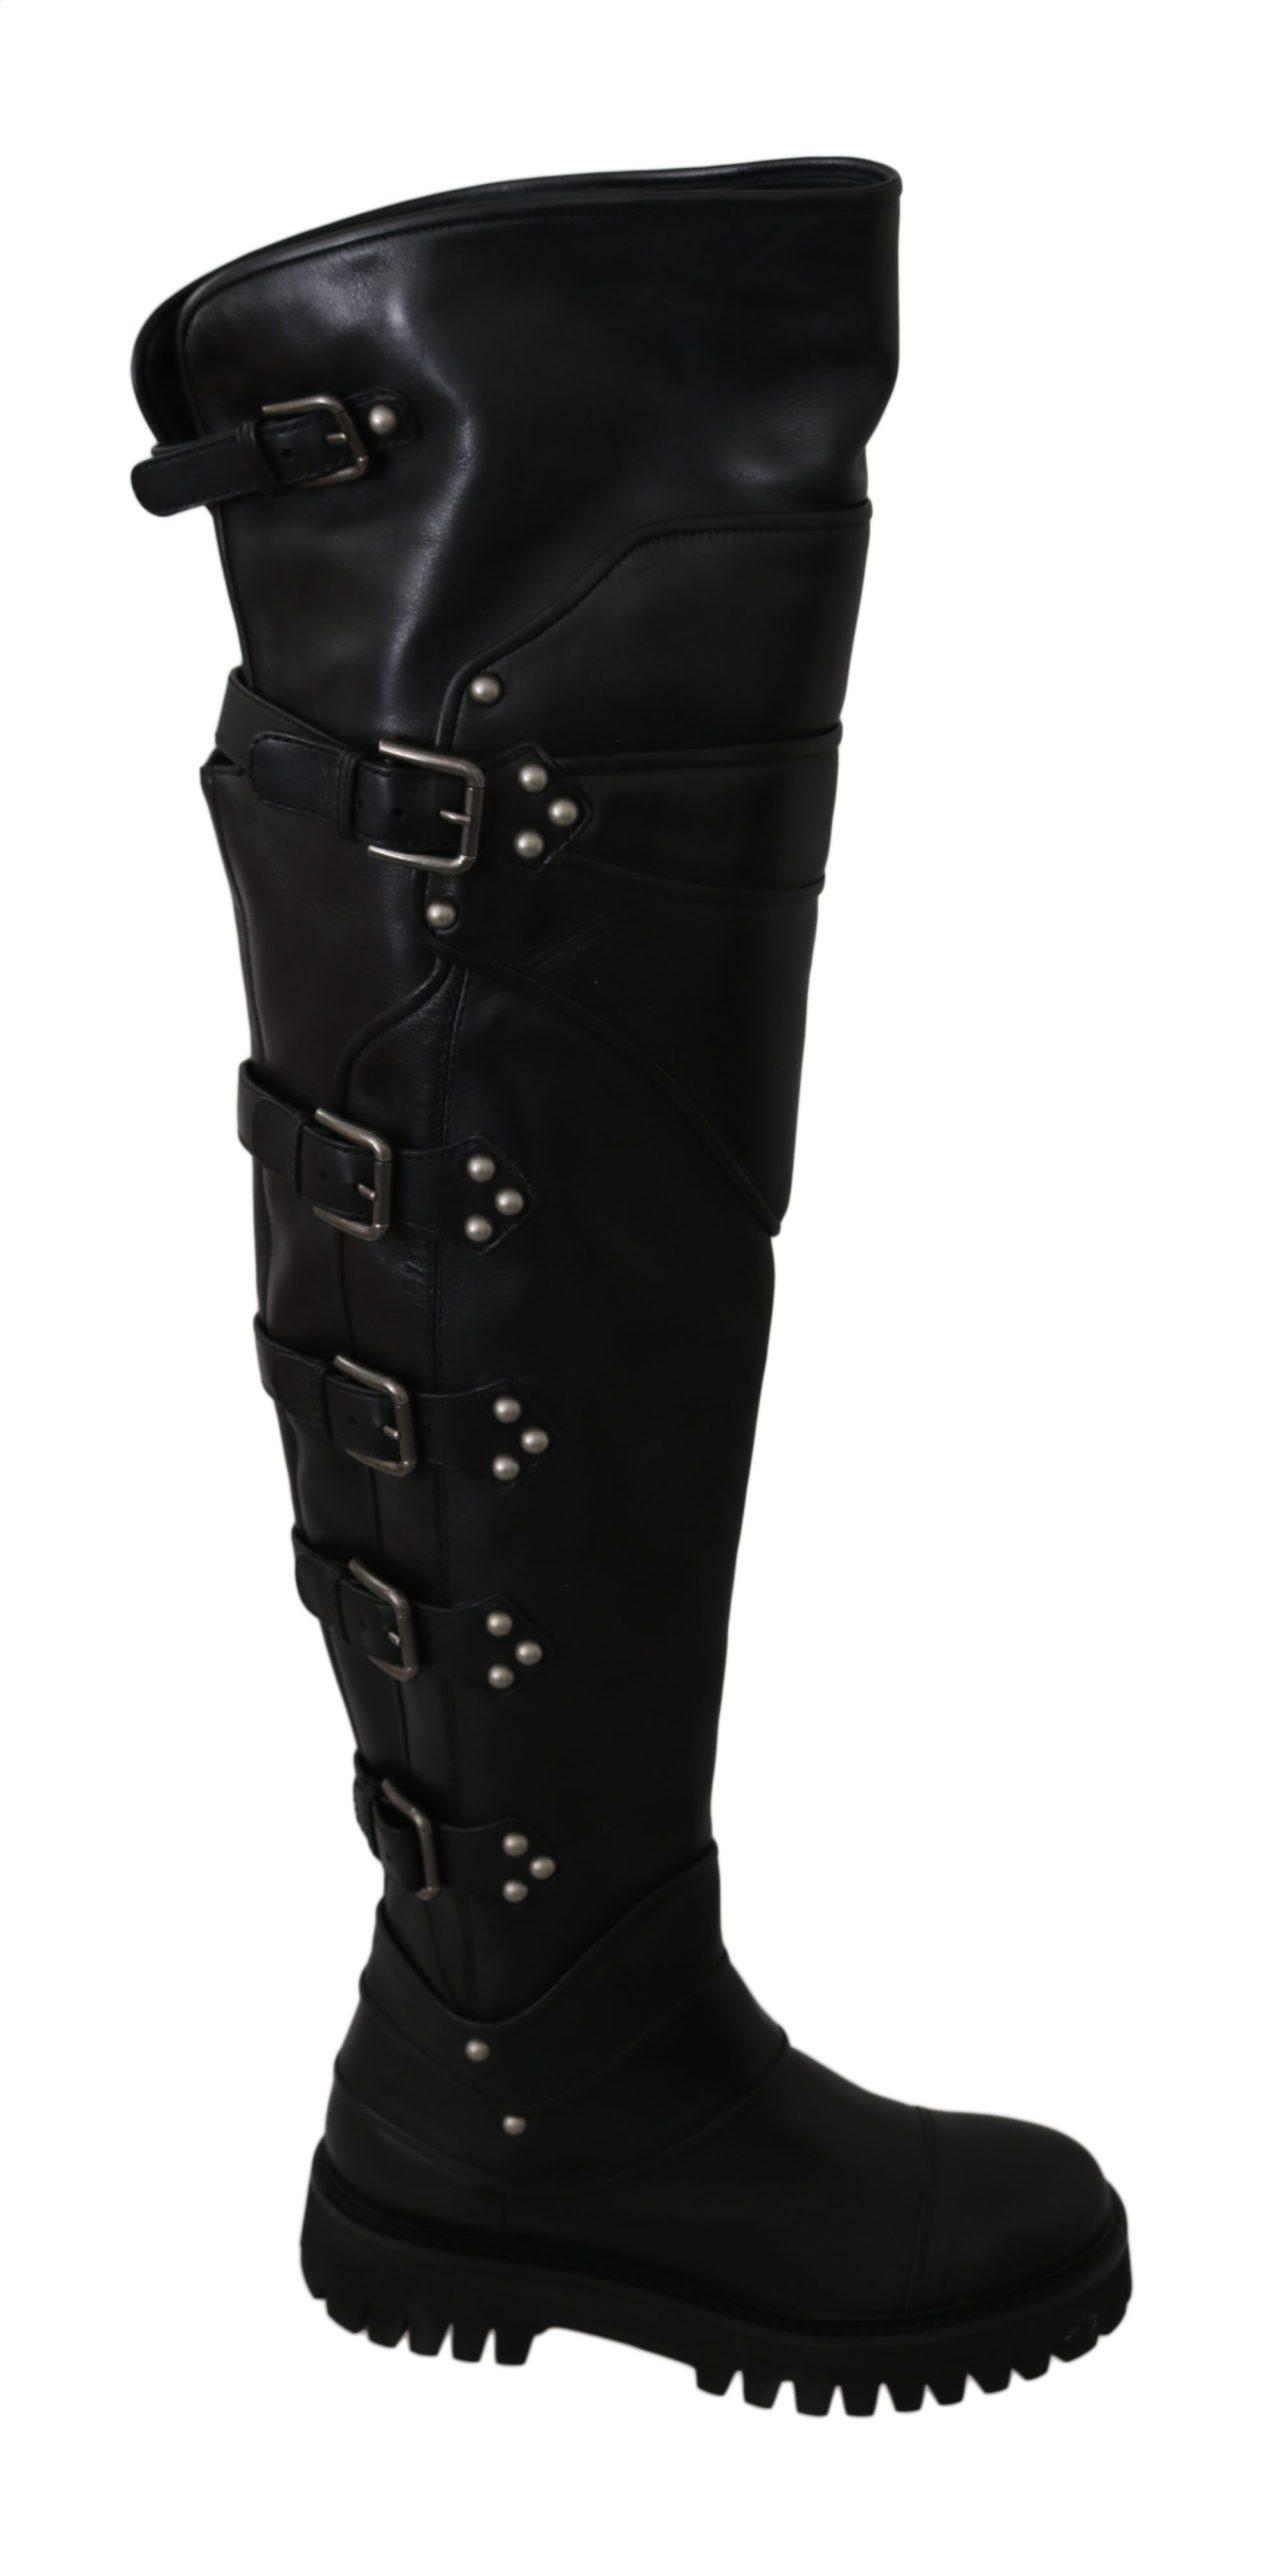 Dolce & Gabbana Leather Over Knee Biker Boots Black LA5890 - EU37/US6.5